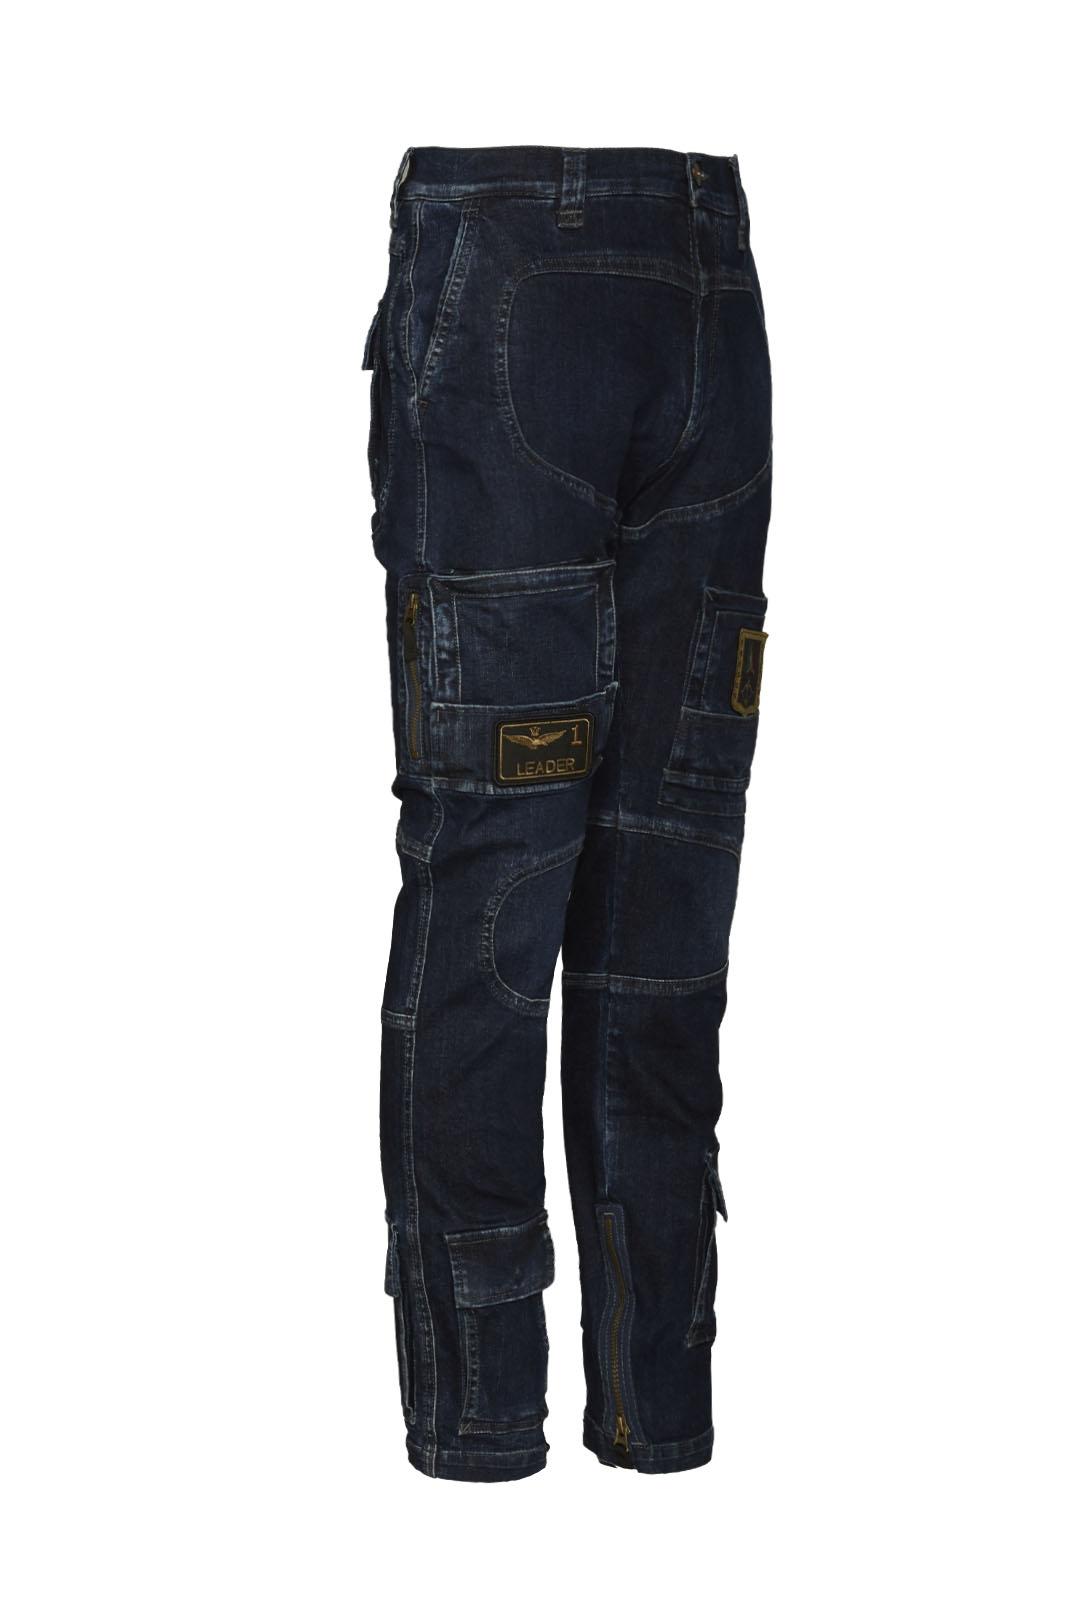 Anti-G Hose aus Stretch Jeans Stoff      3